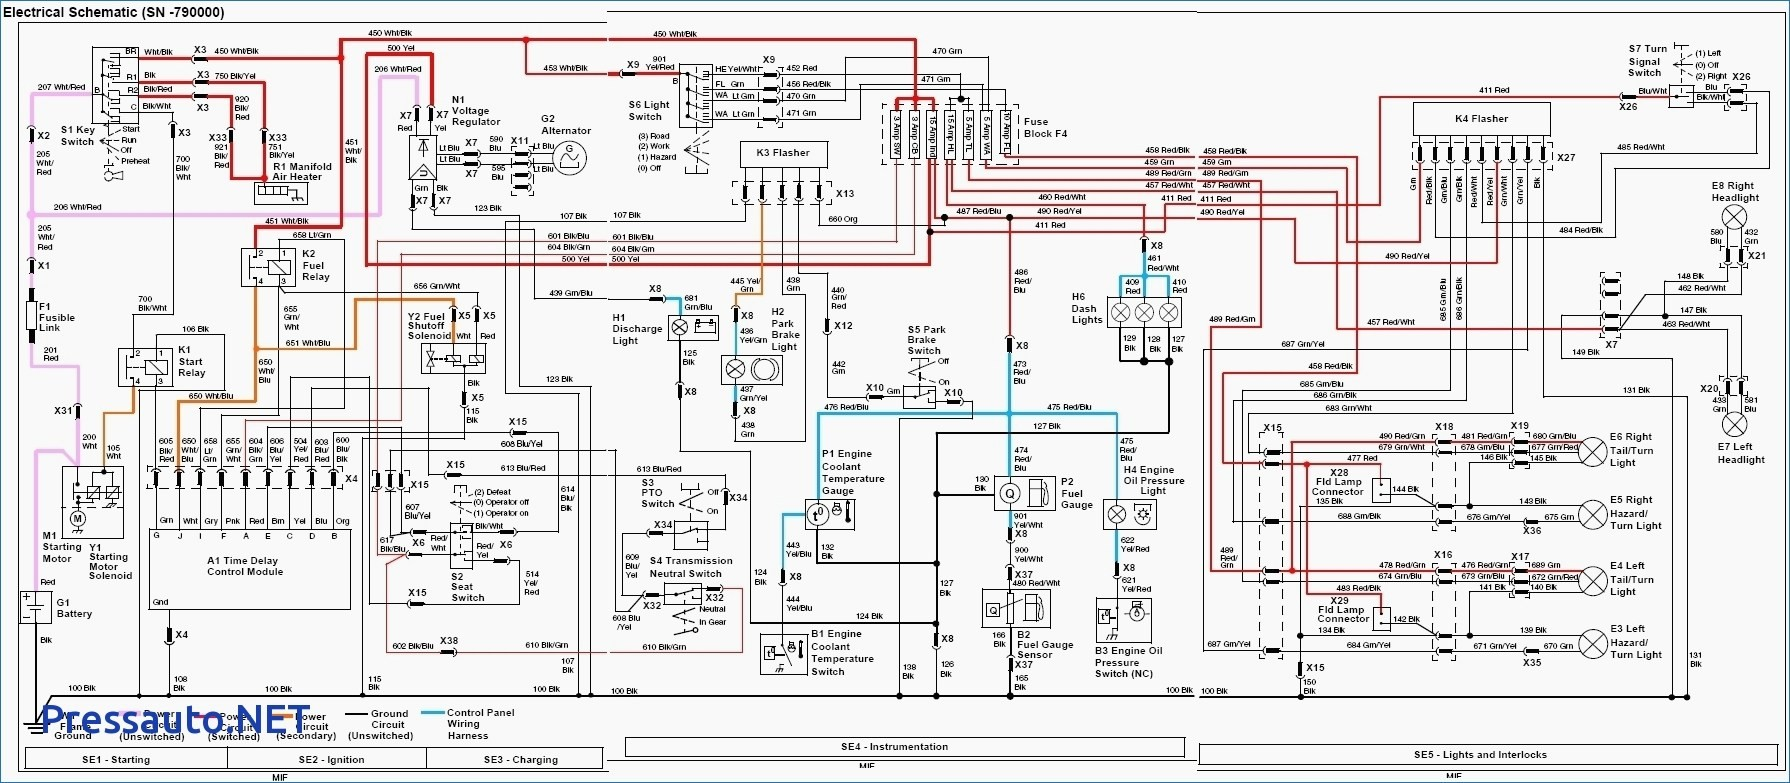 Jd 165 Wiring Diagram | Machine Repair Manual Jd Wiring Diagram on